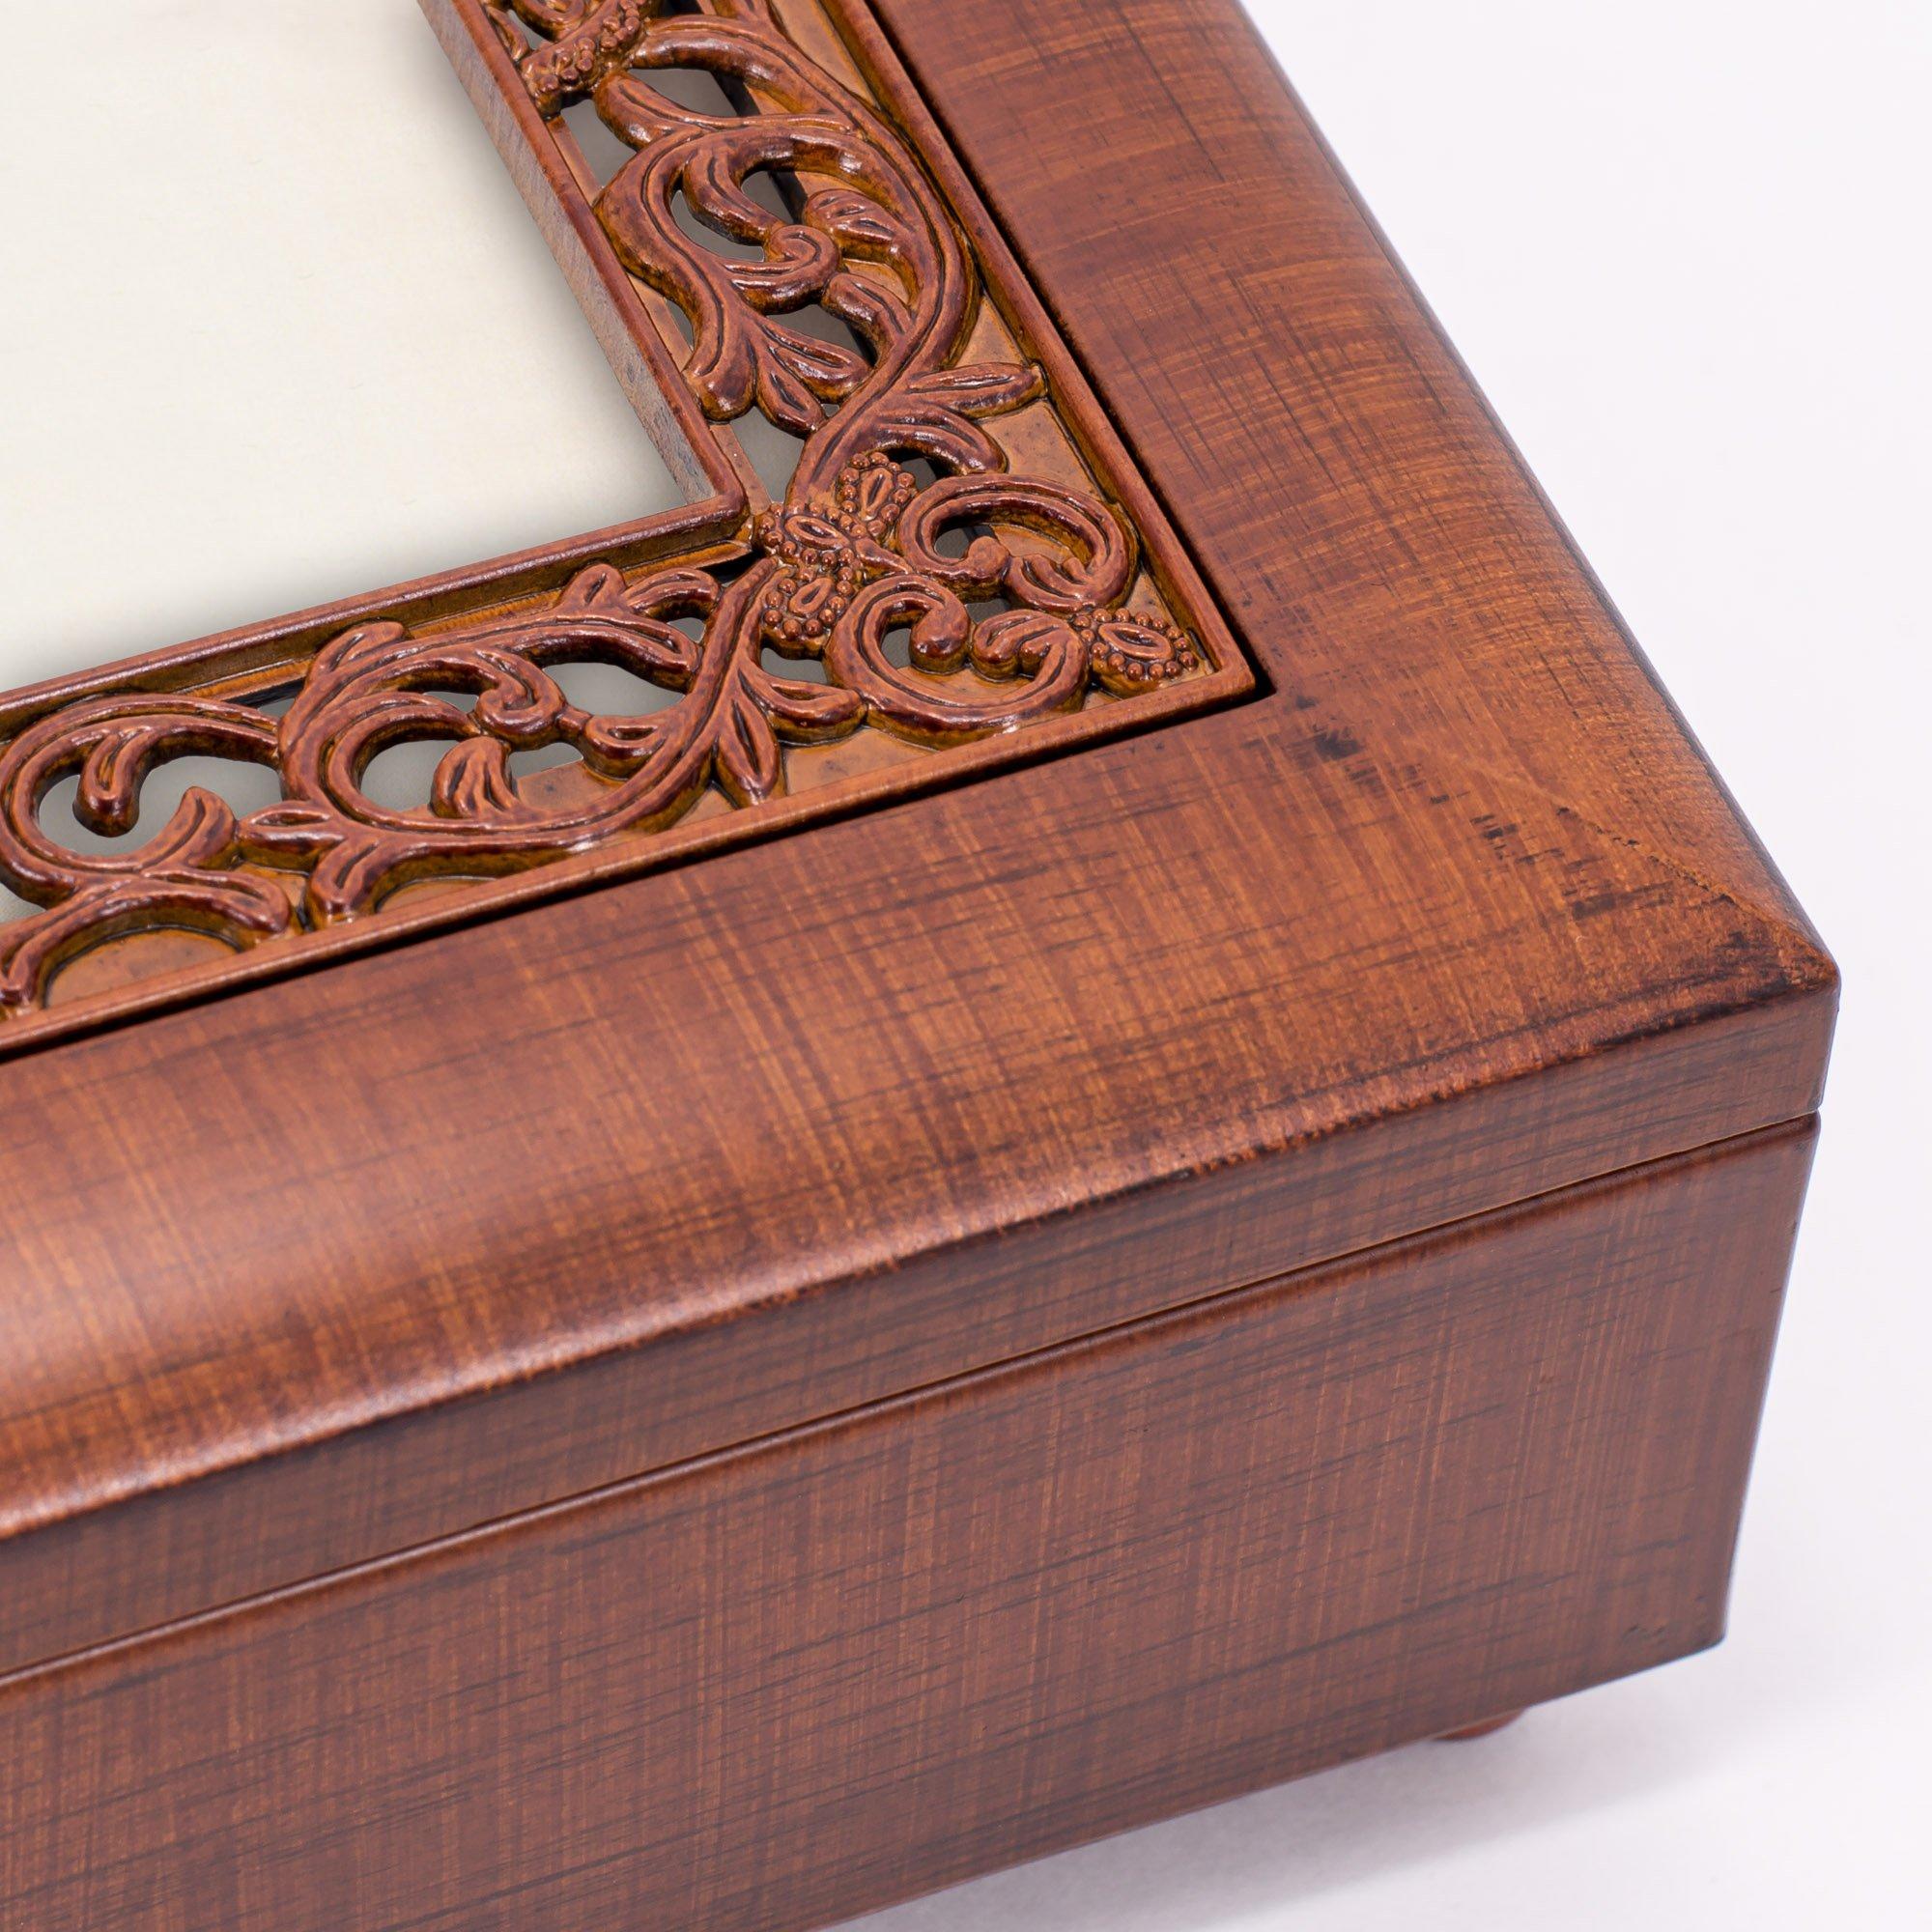 Cottage Garden Sister Woodgrain Ornate Music Box Plays Wonderful World by Cottage Garden (Image #6)